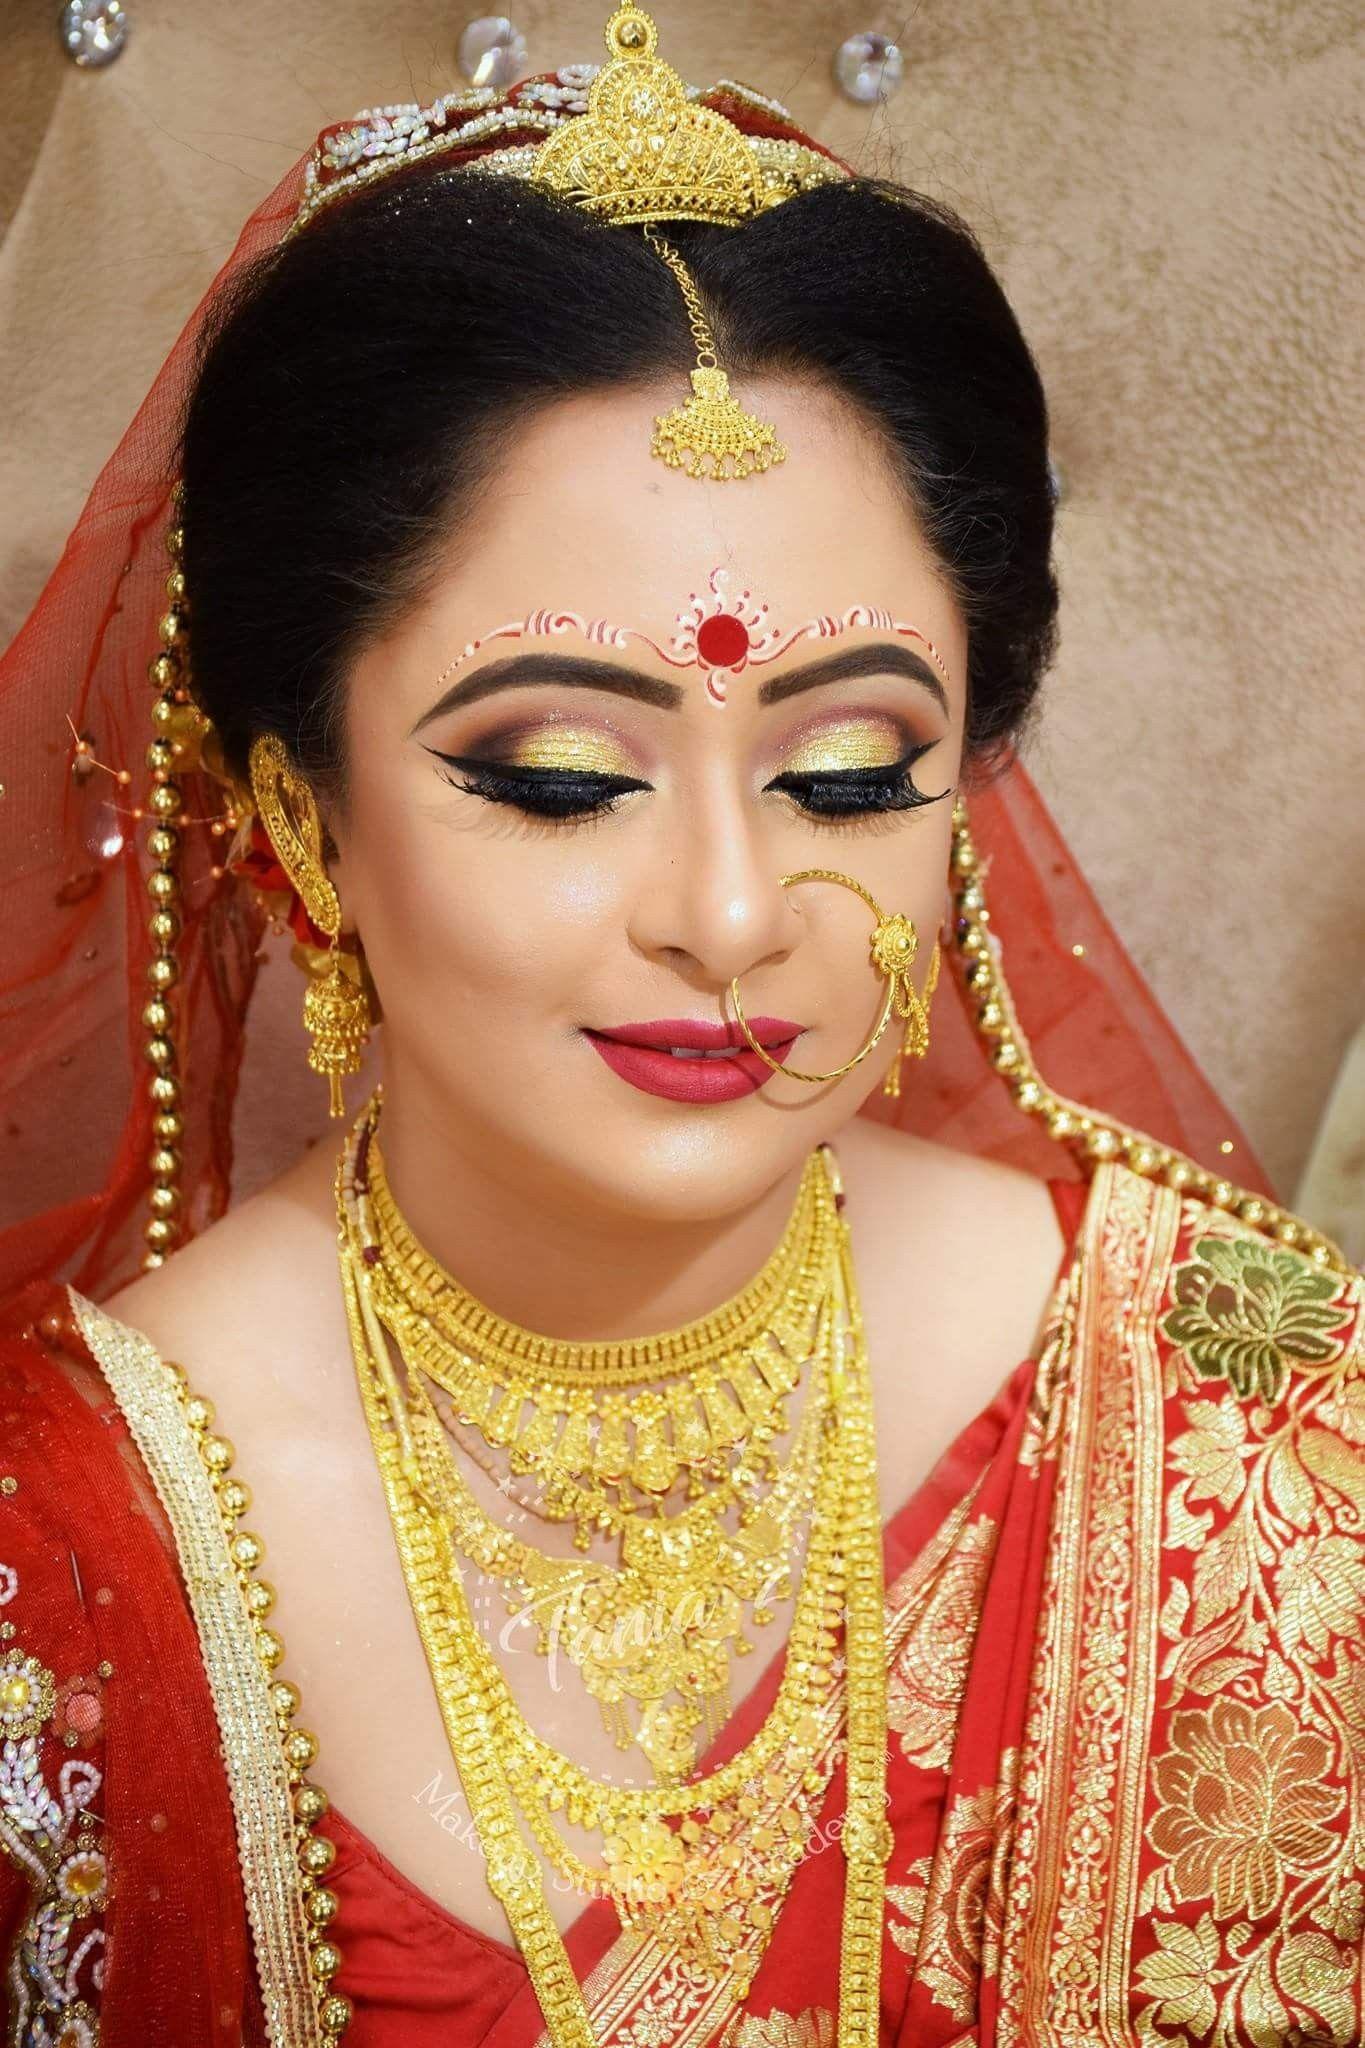 Pin by shree on Bridal Pinterest Bengali bride Gold jewellery